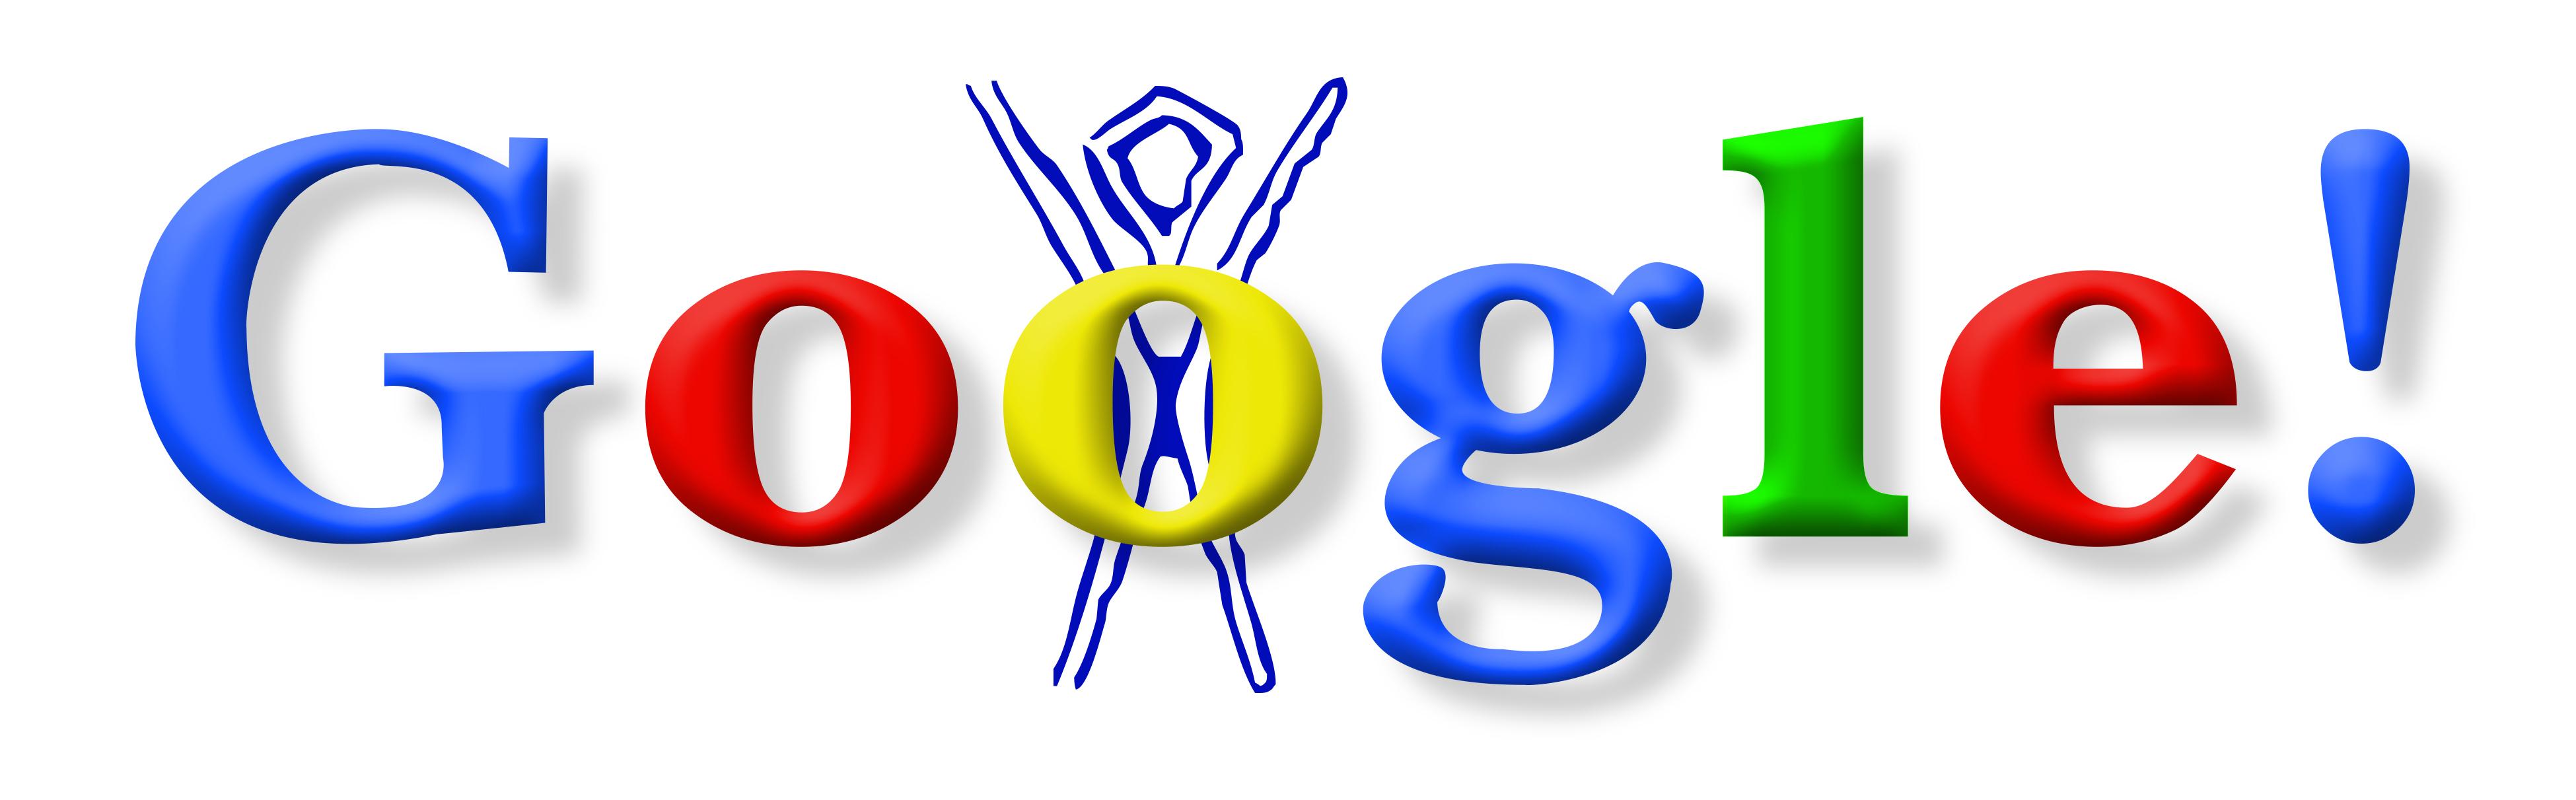 1er Google Doodle datant de 1998 à l'occasion du festival Burning Man